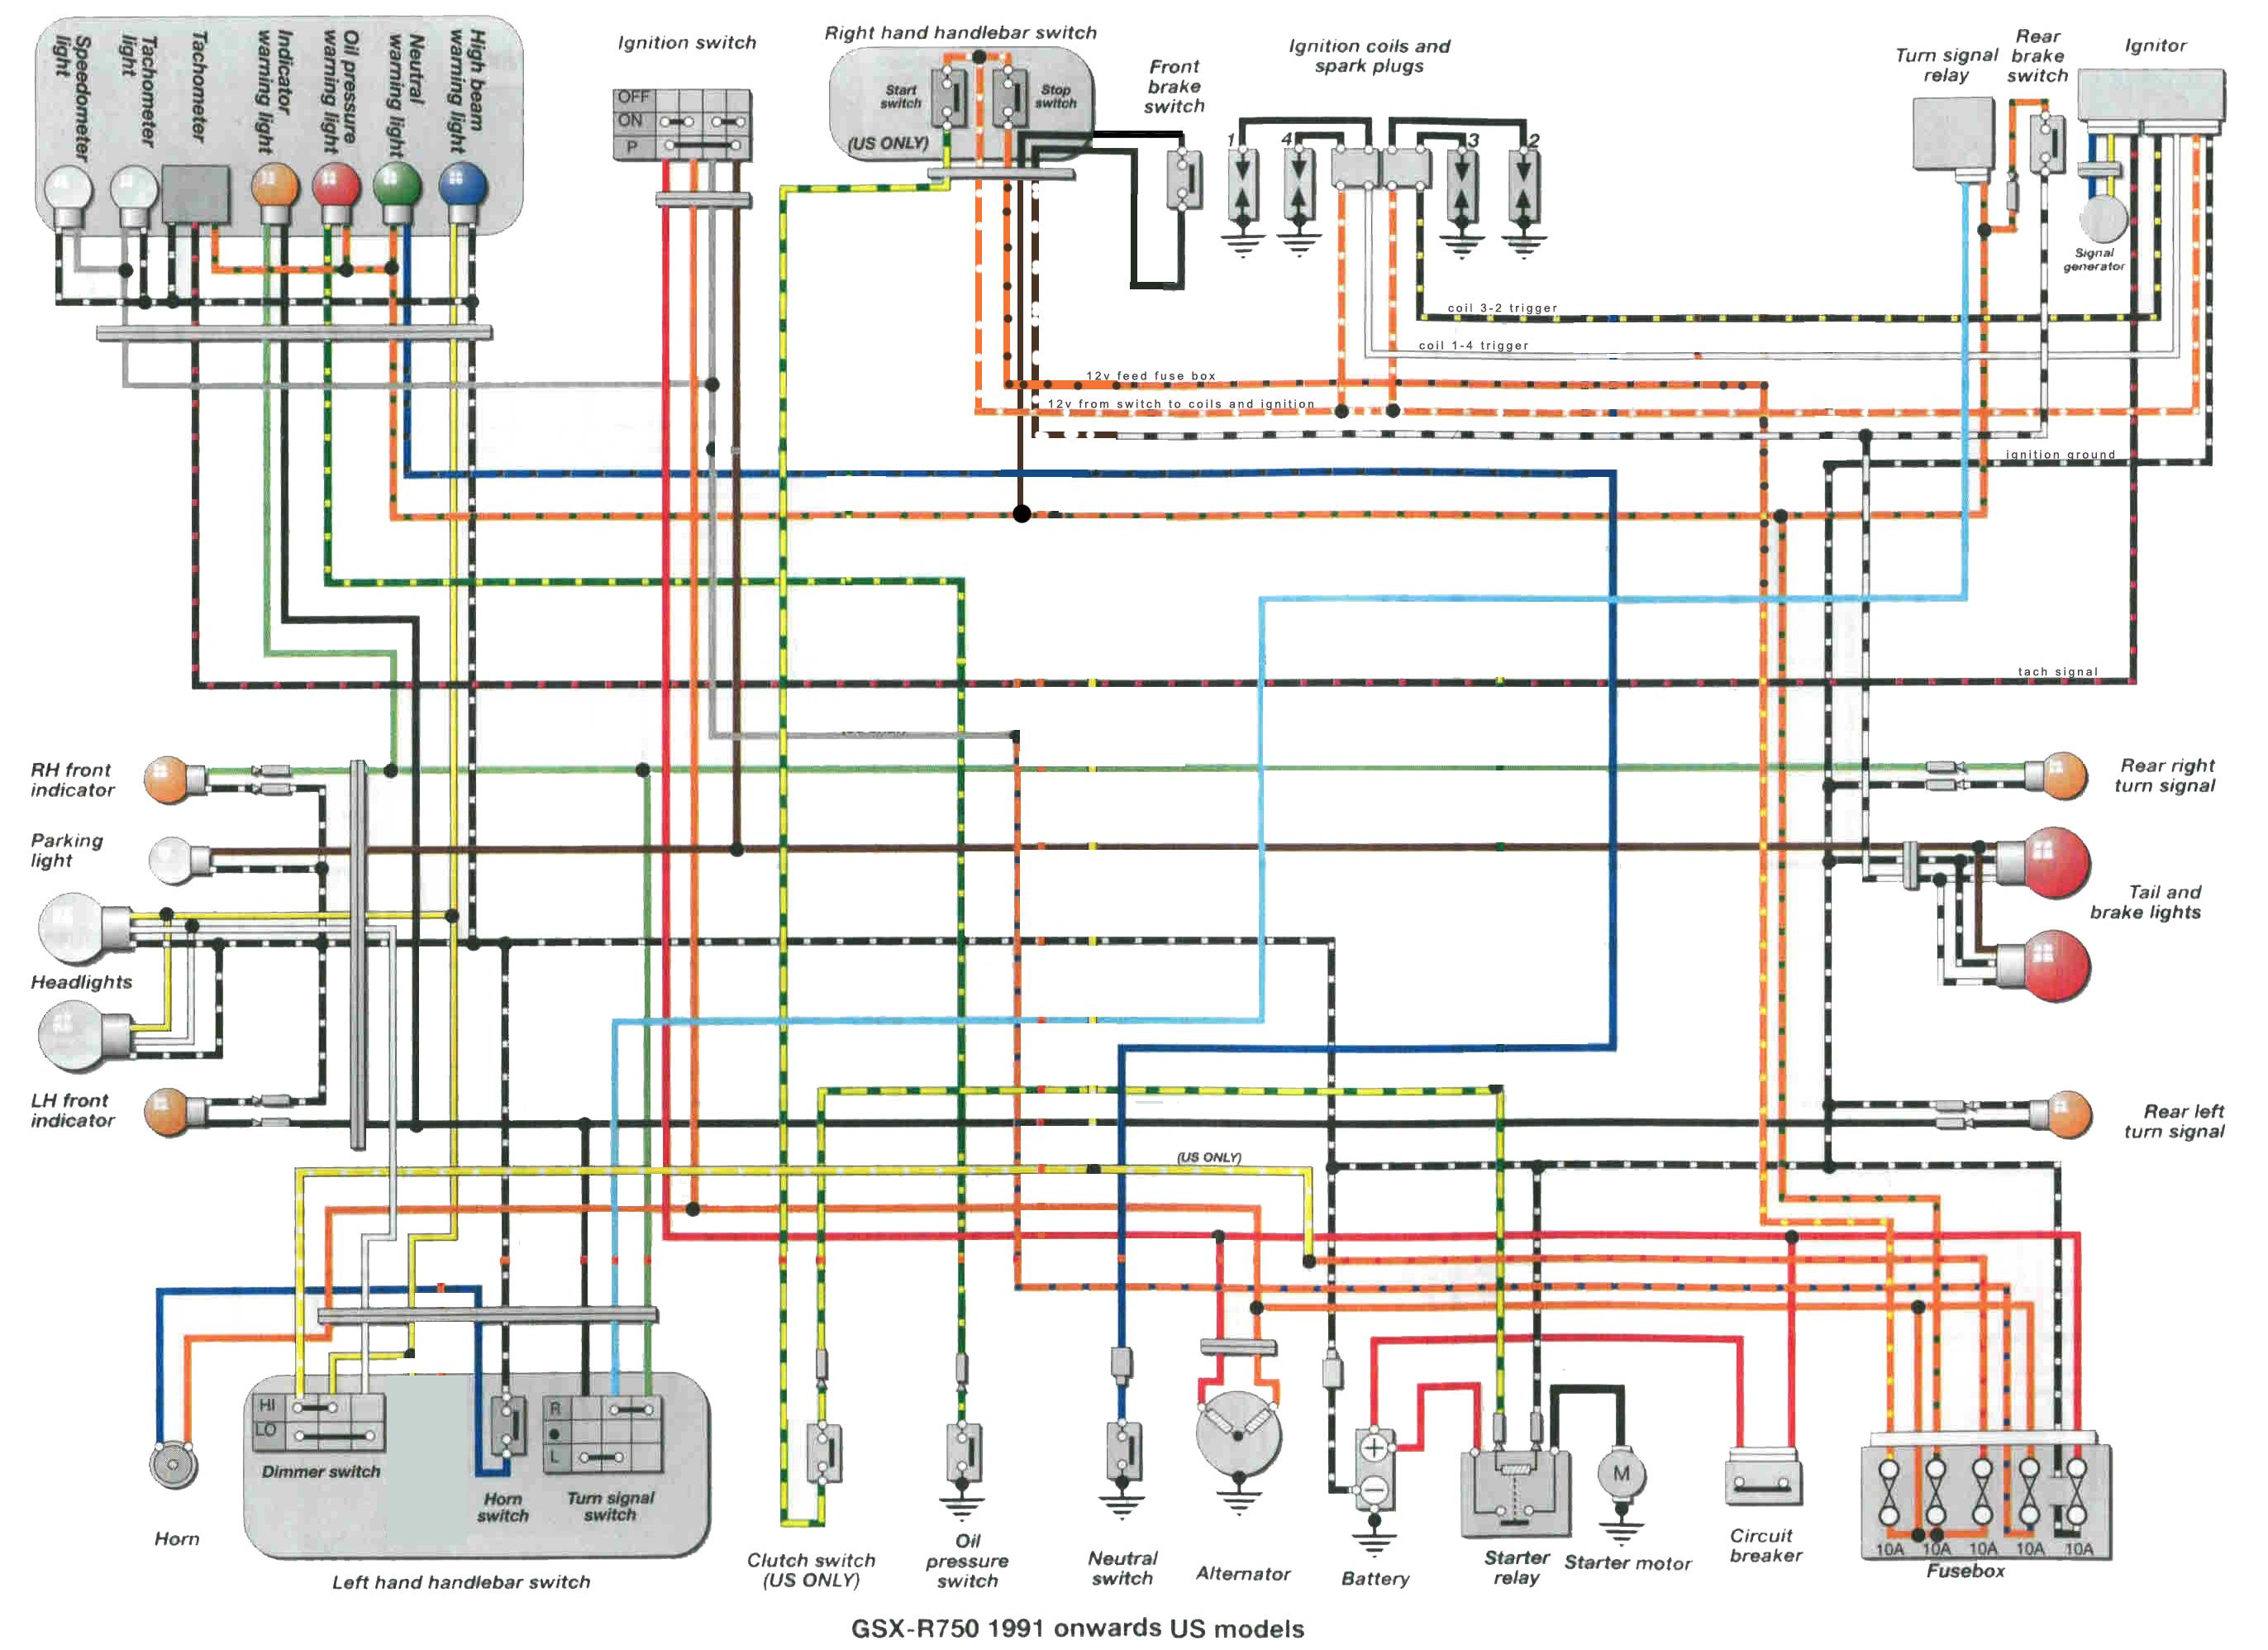 Surprising Gsxr 750 Wiring Diagram Wiring Diagram Data Wiring Cloud Histehirlexornumapkesianilluminateatxorg